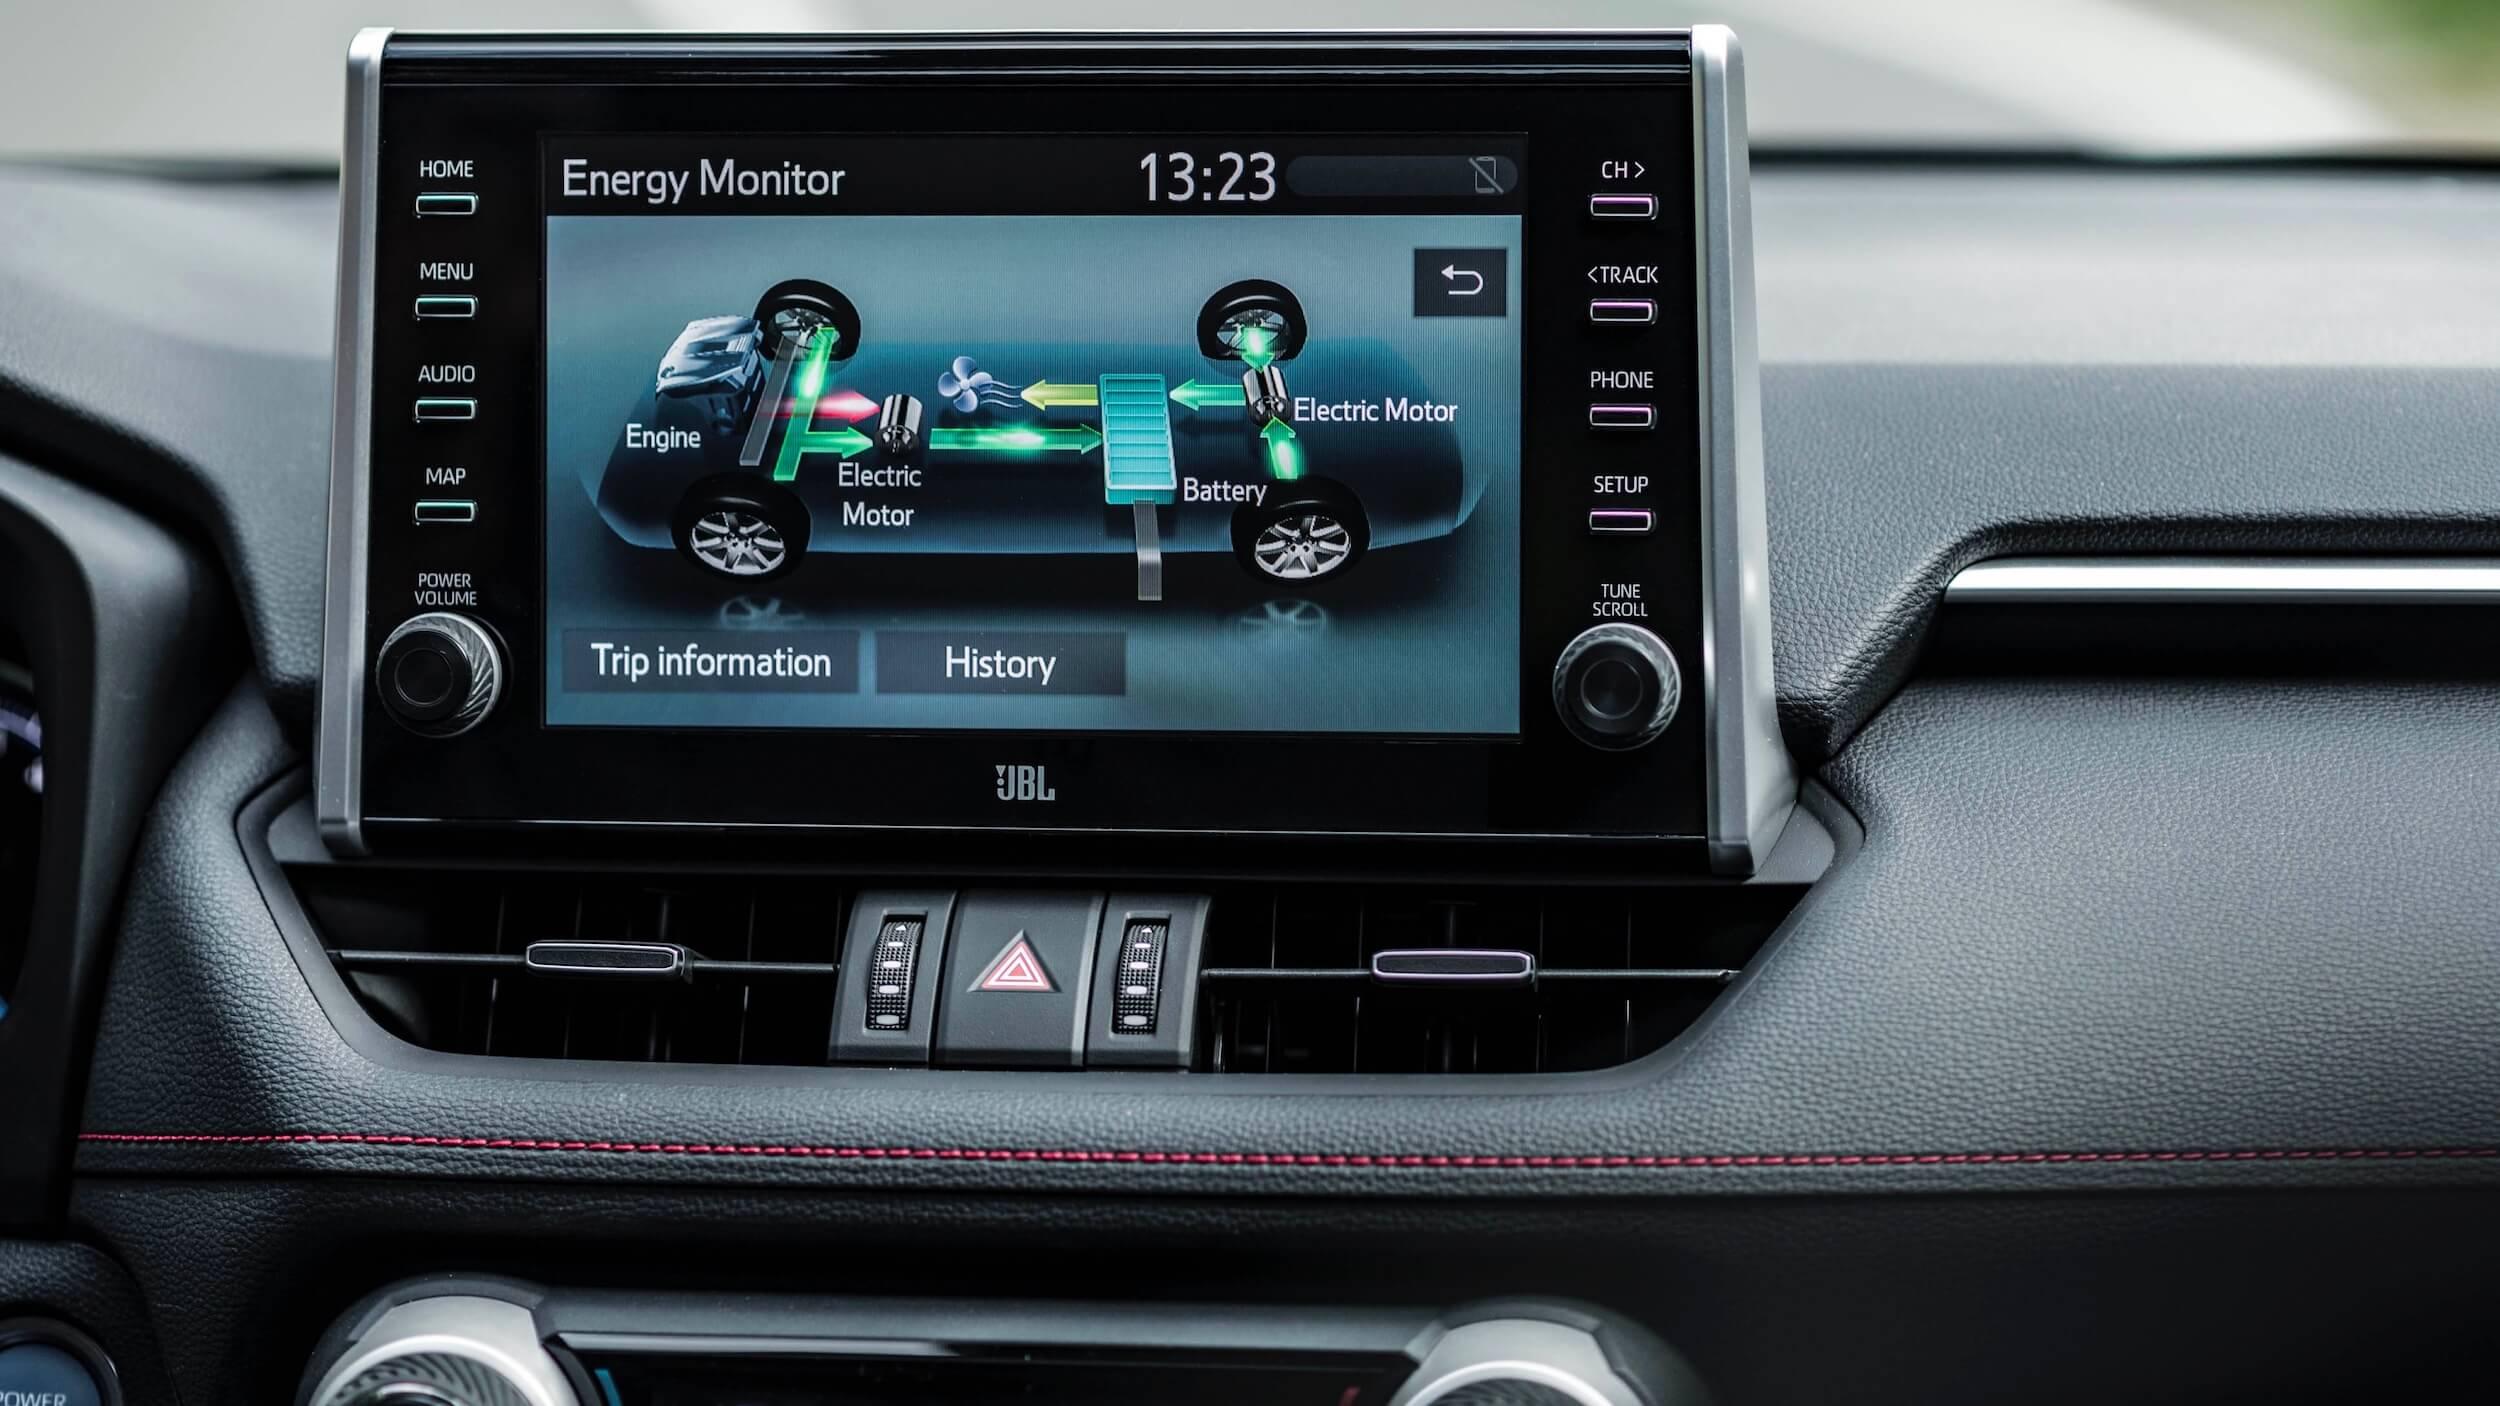 Toyota RAV4 Plug in hybride infotainment